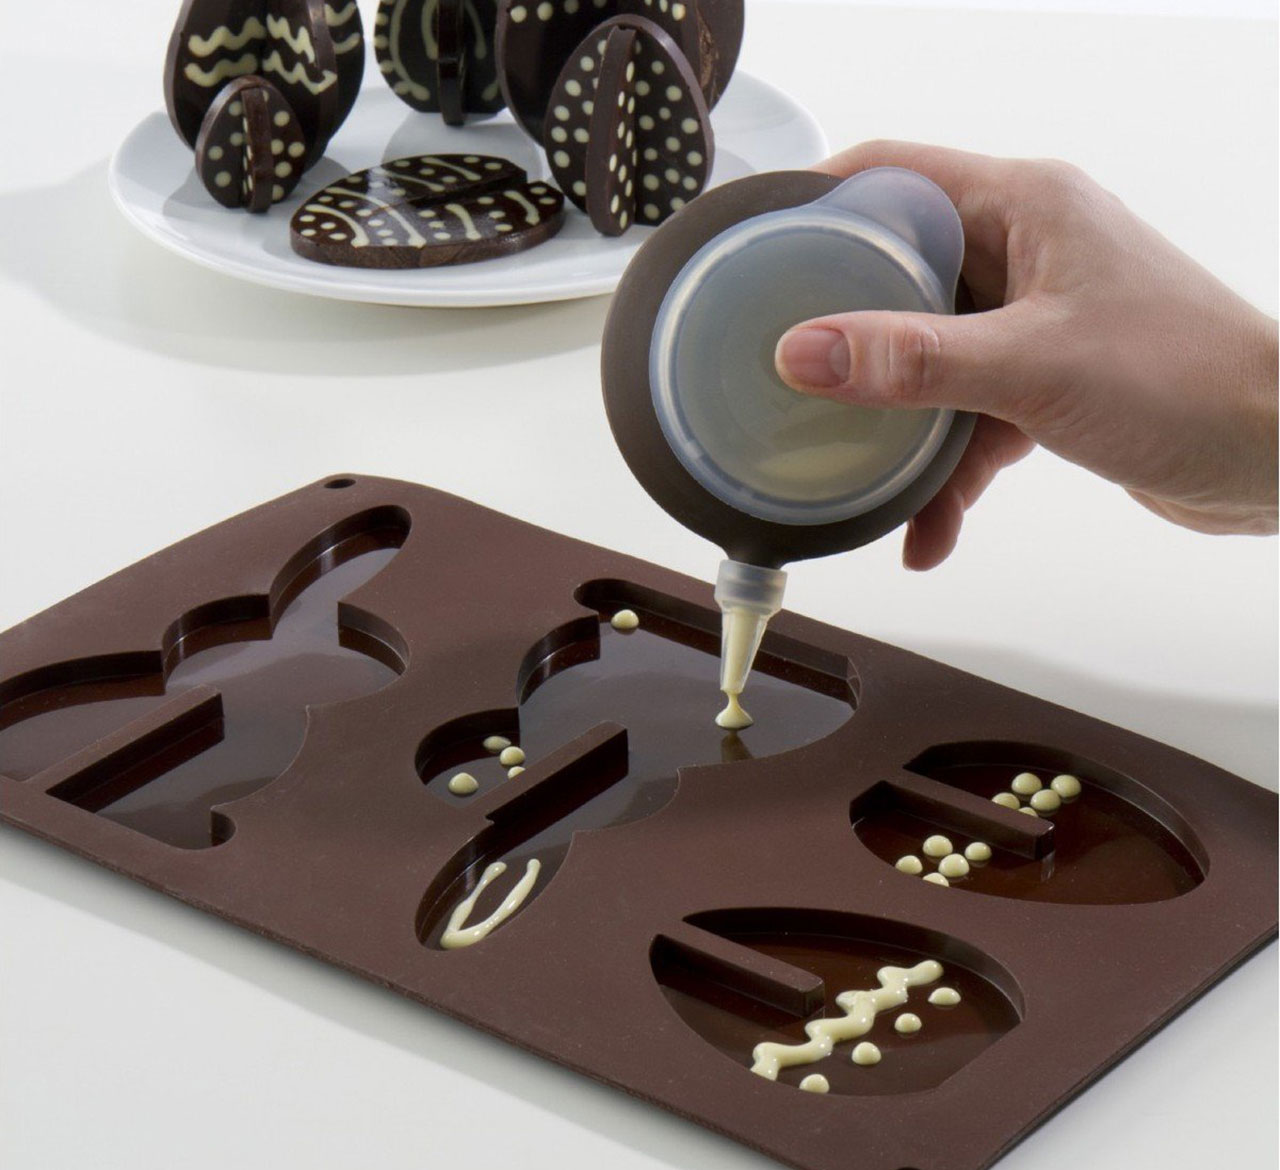 Залить шоколад в форму